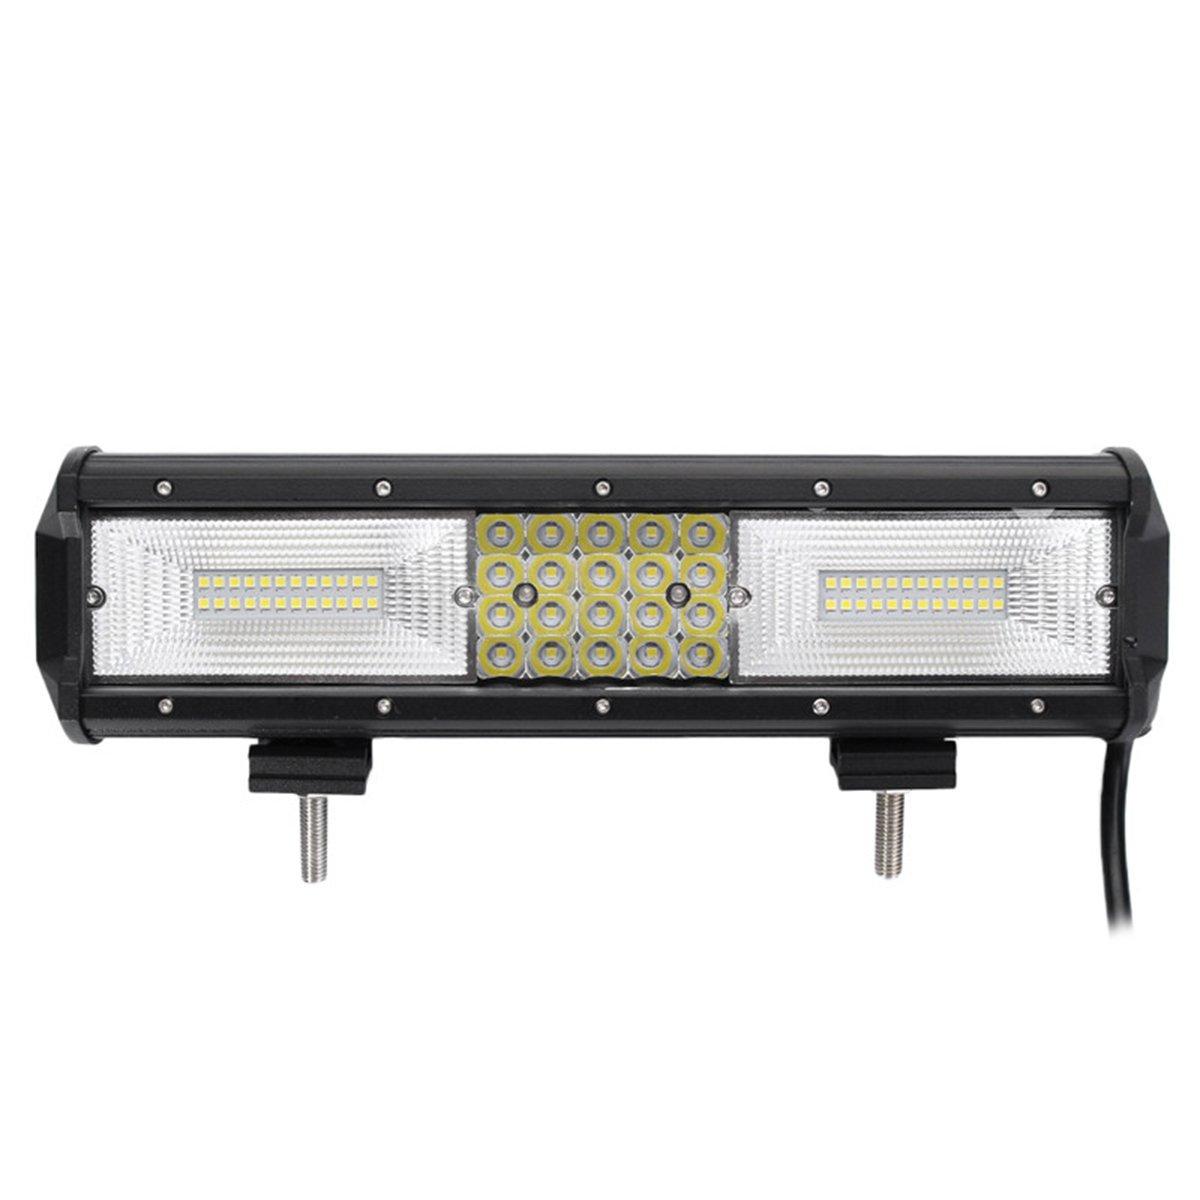 VORCOOL 12 pollici 130200LM 68 LED 10-30V 840W Light Bar fuoristrada guida fendinebbia impermeabile lavoro leggero per Van Camper Wagon ATV SUV (nero) 4VJ3314X9L8J14BKS0XTS0